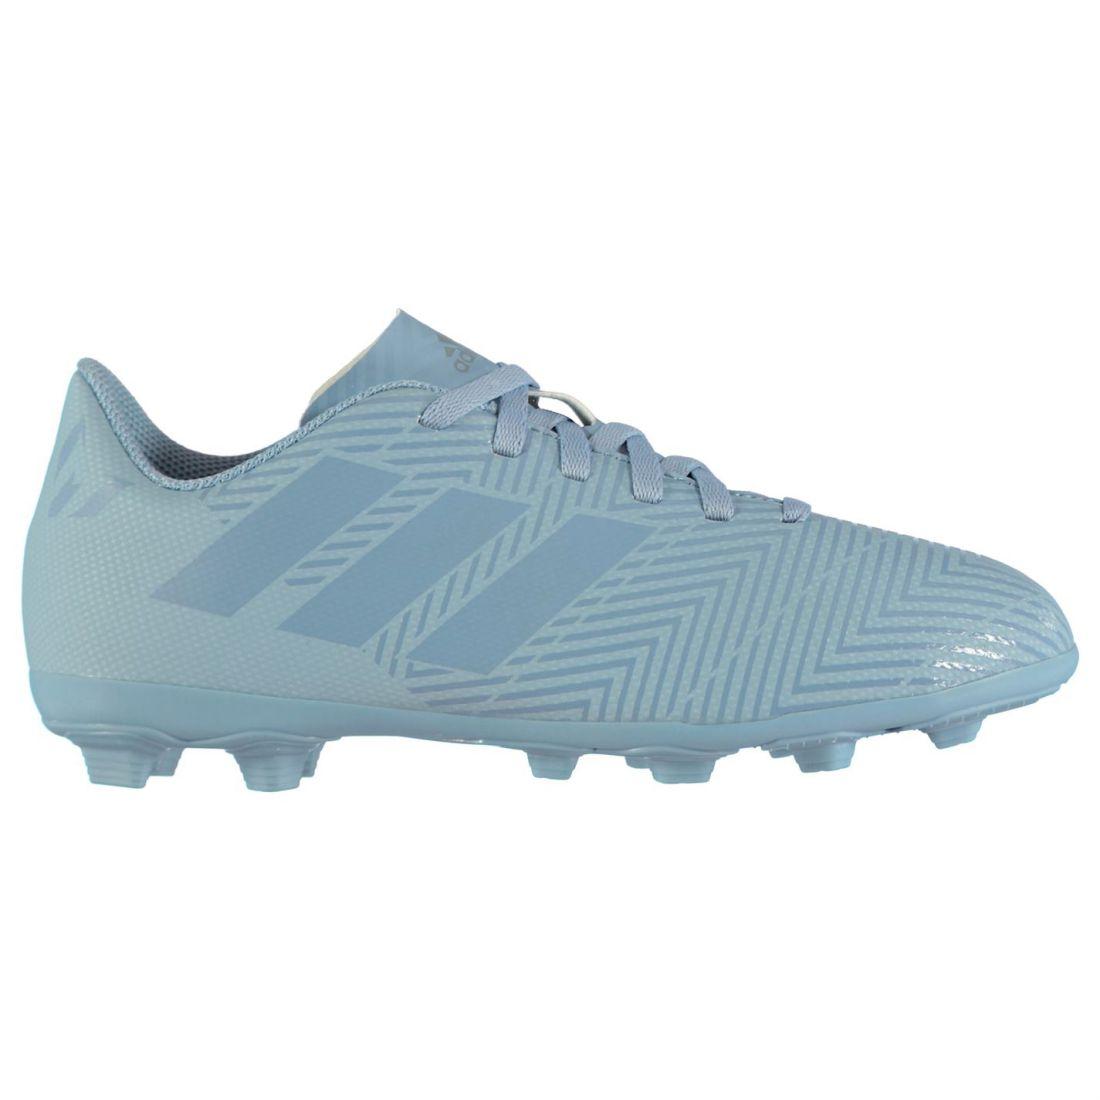 5c1689ceb Adidas Nemziz Messi 18.4 FG Childrens Football Boots Firm Ground Laces  Fastened